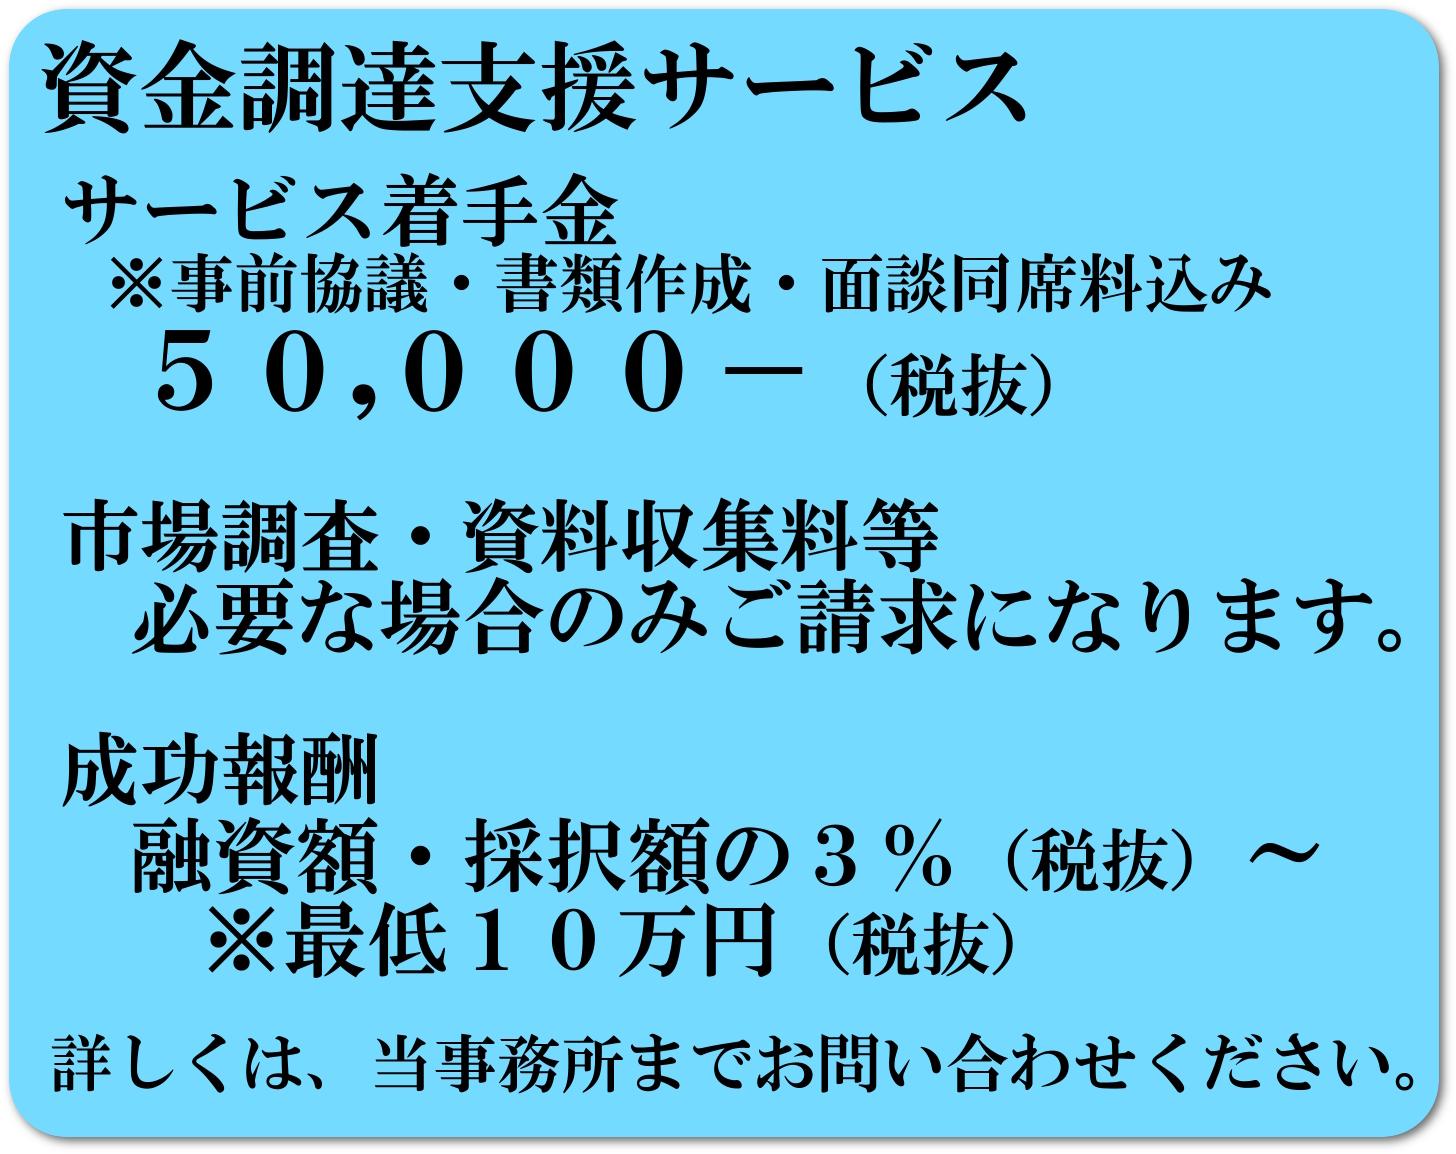 資金調達支援サービス 着手金5万円 成功報酬決定額の3%~